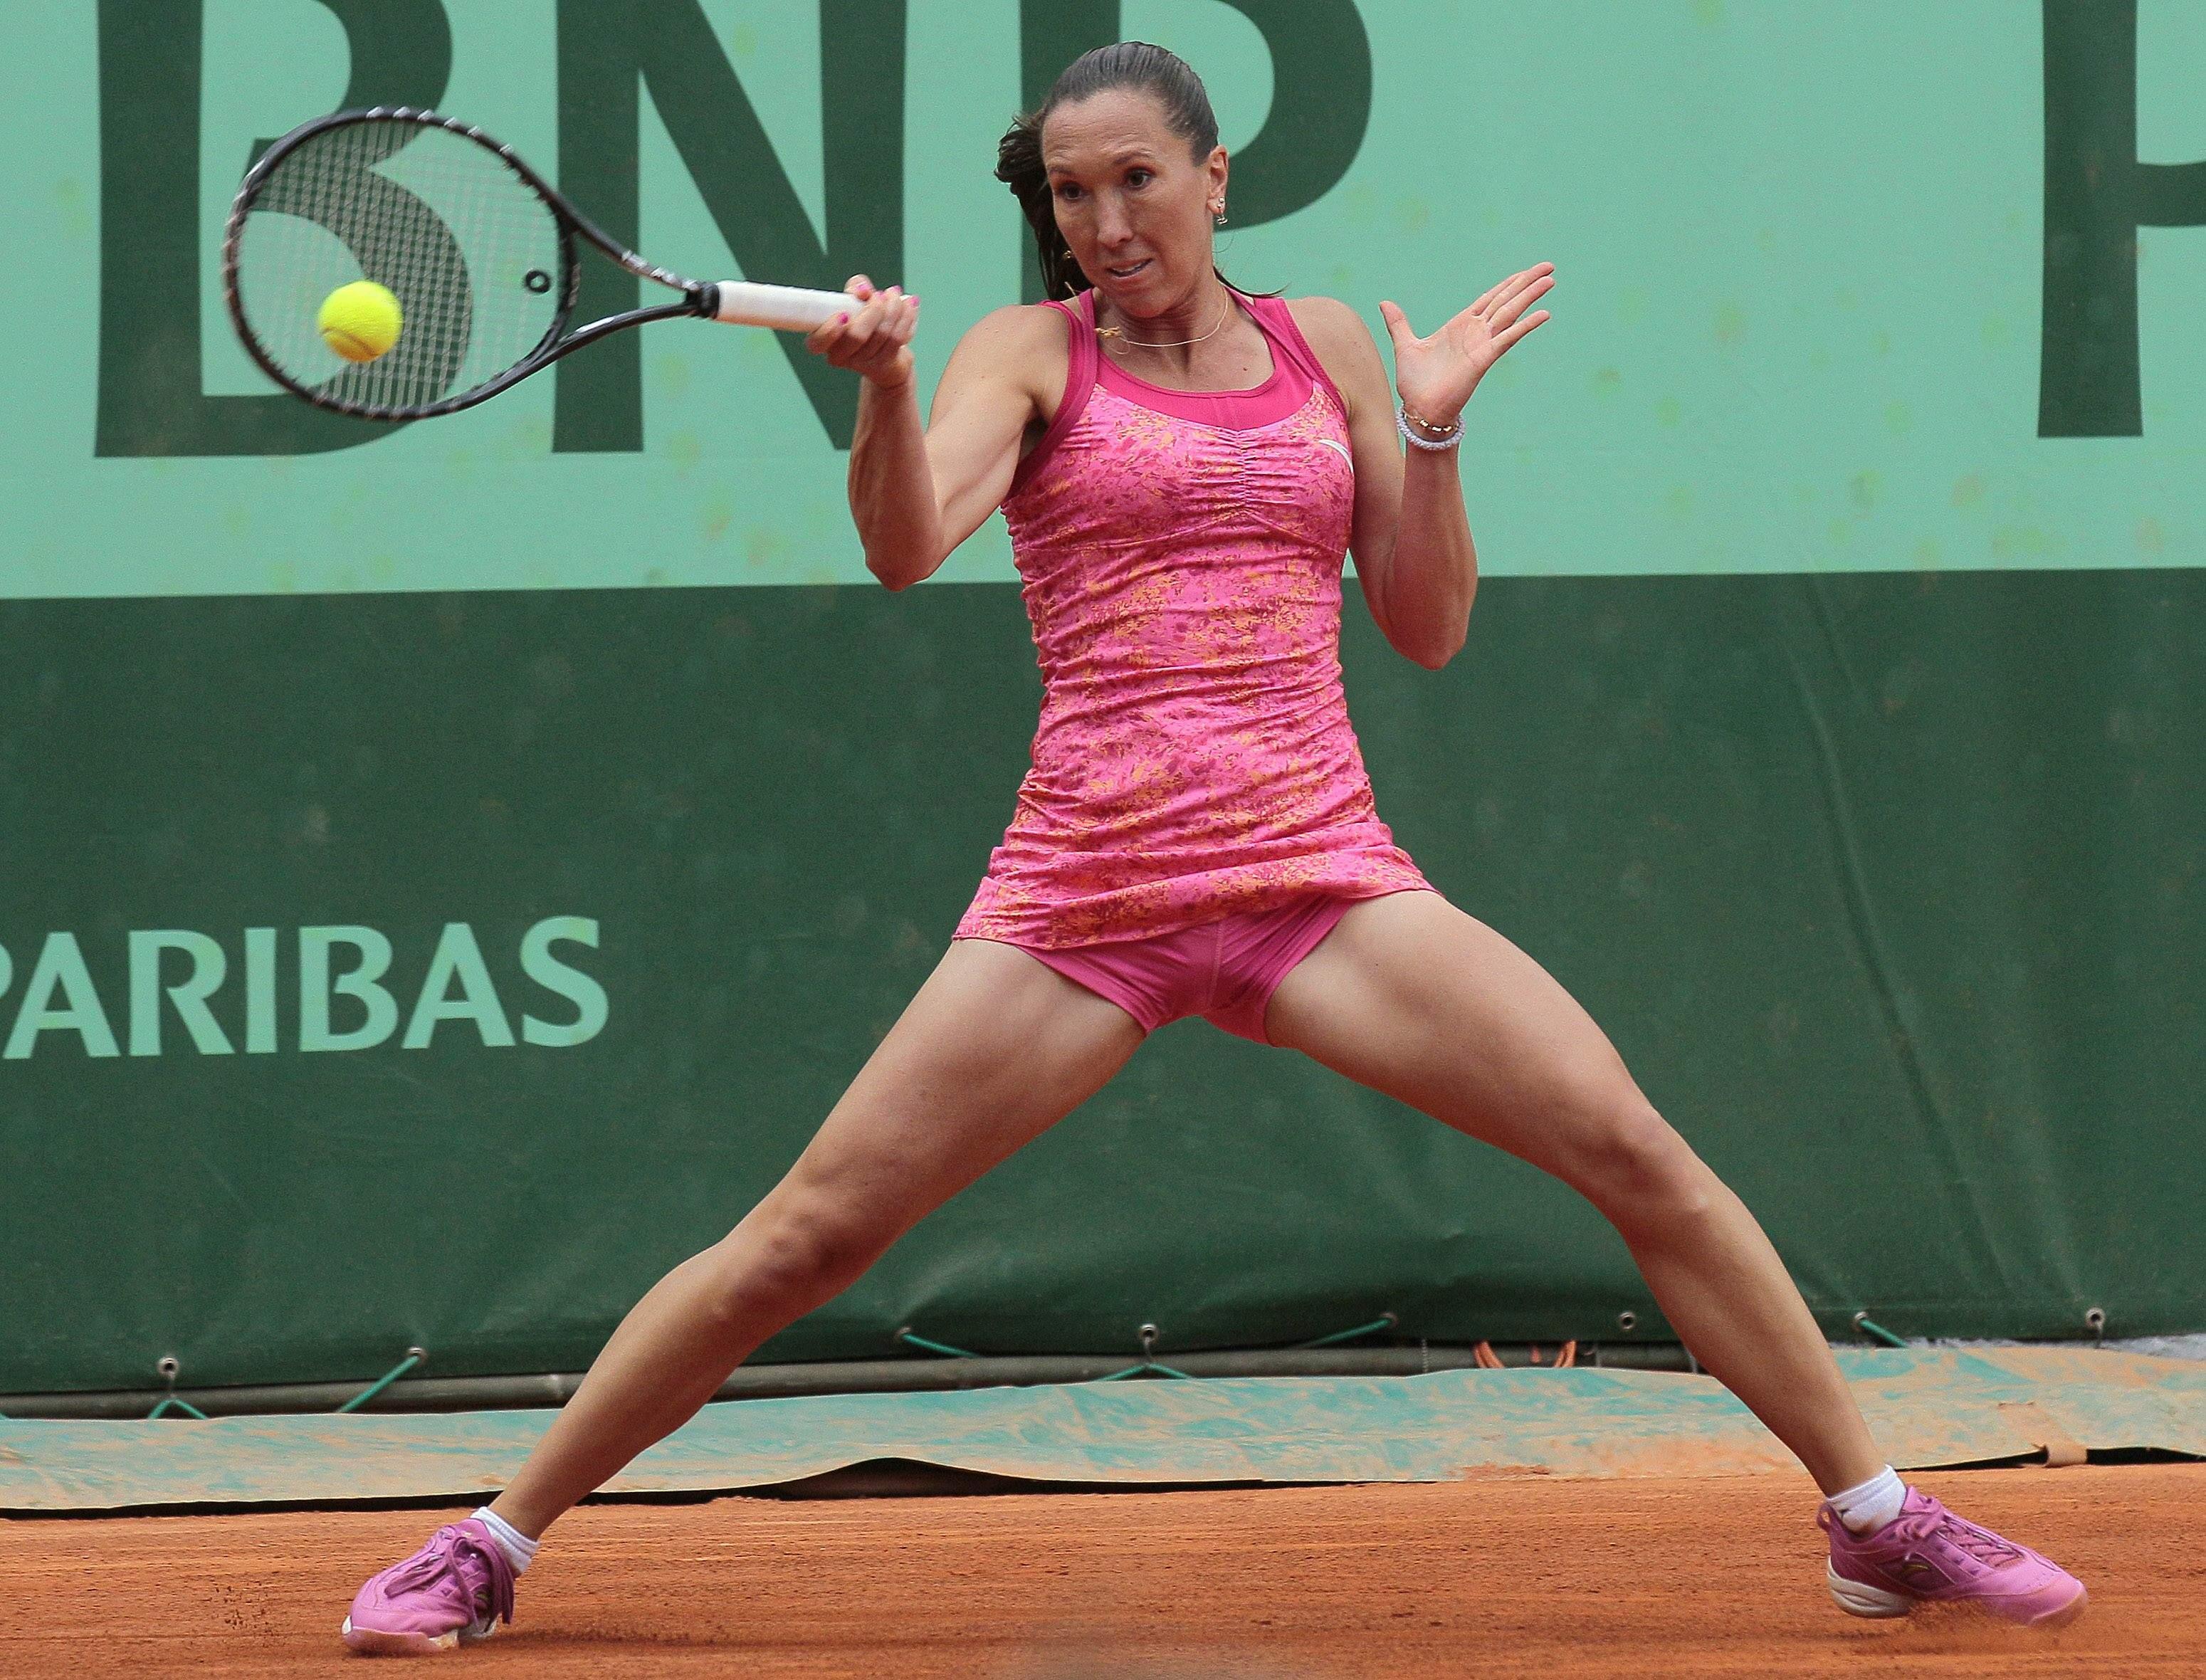 Jelena Jankovic Kosty 555 info 0059